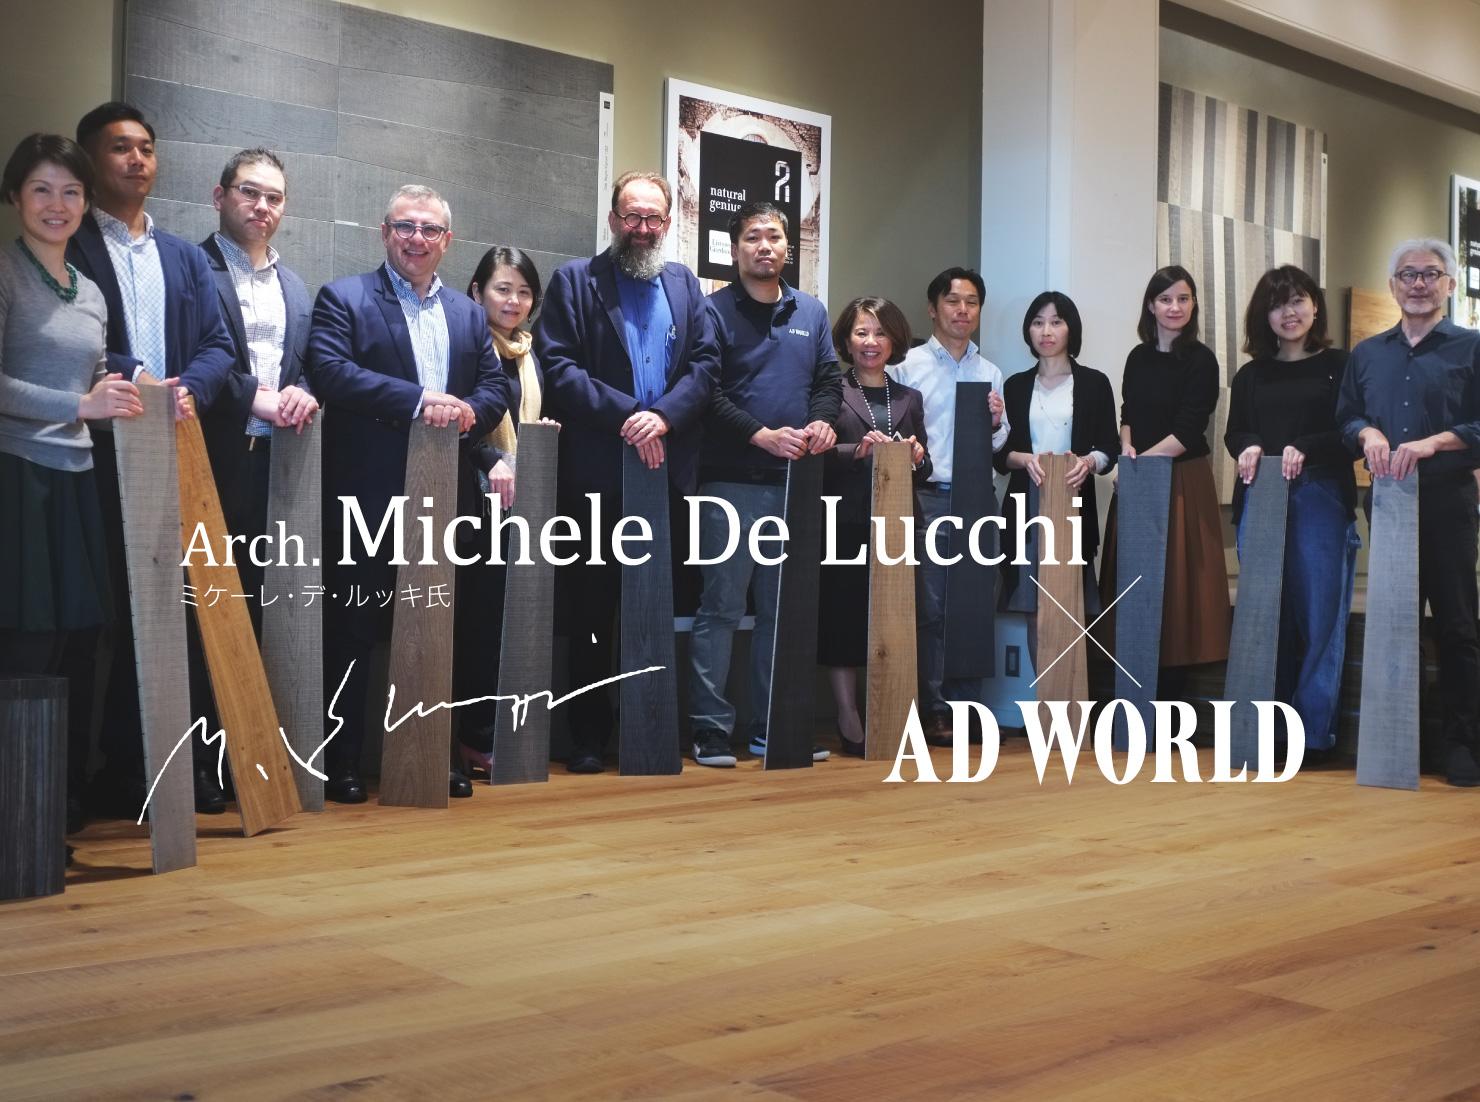 Arch.Michele De Lucchi ミケーレ・デ・ルッキ氏 × AD WORLD